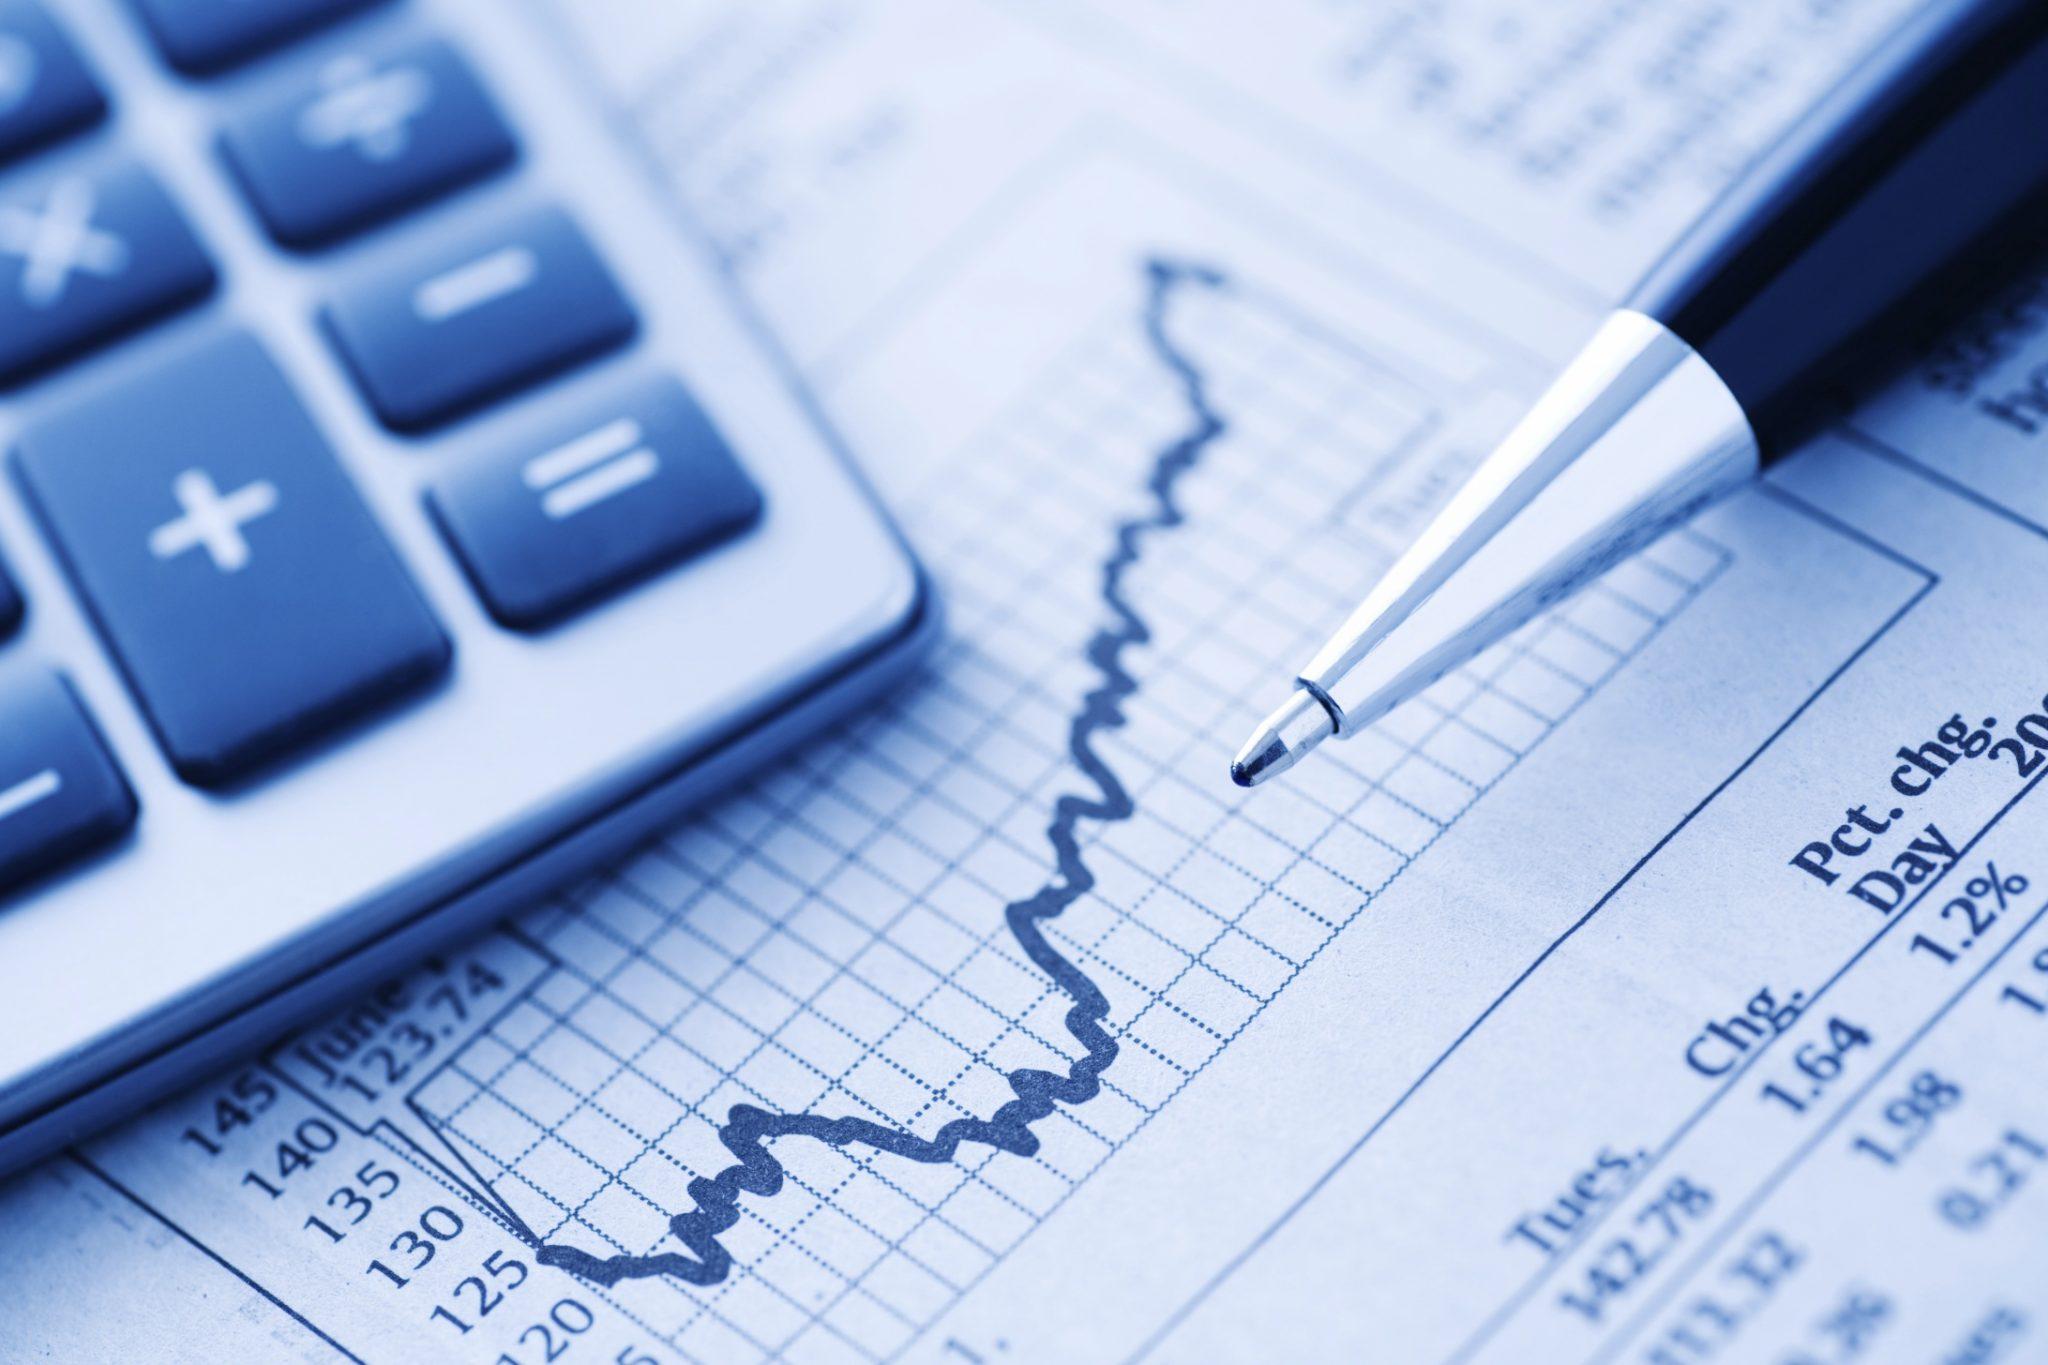 Financial Portals and Stock market research tools post thumbnail image